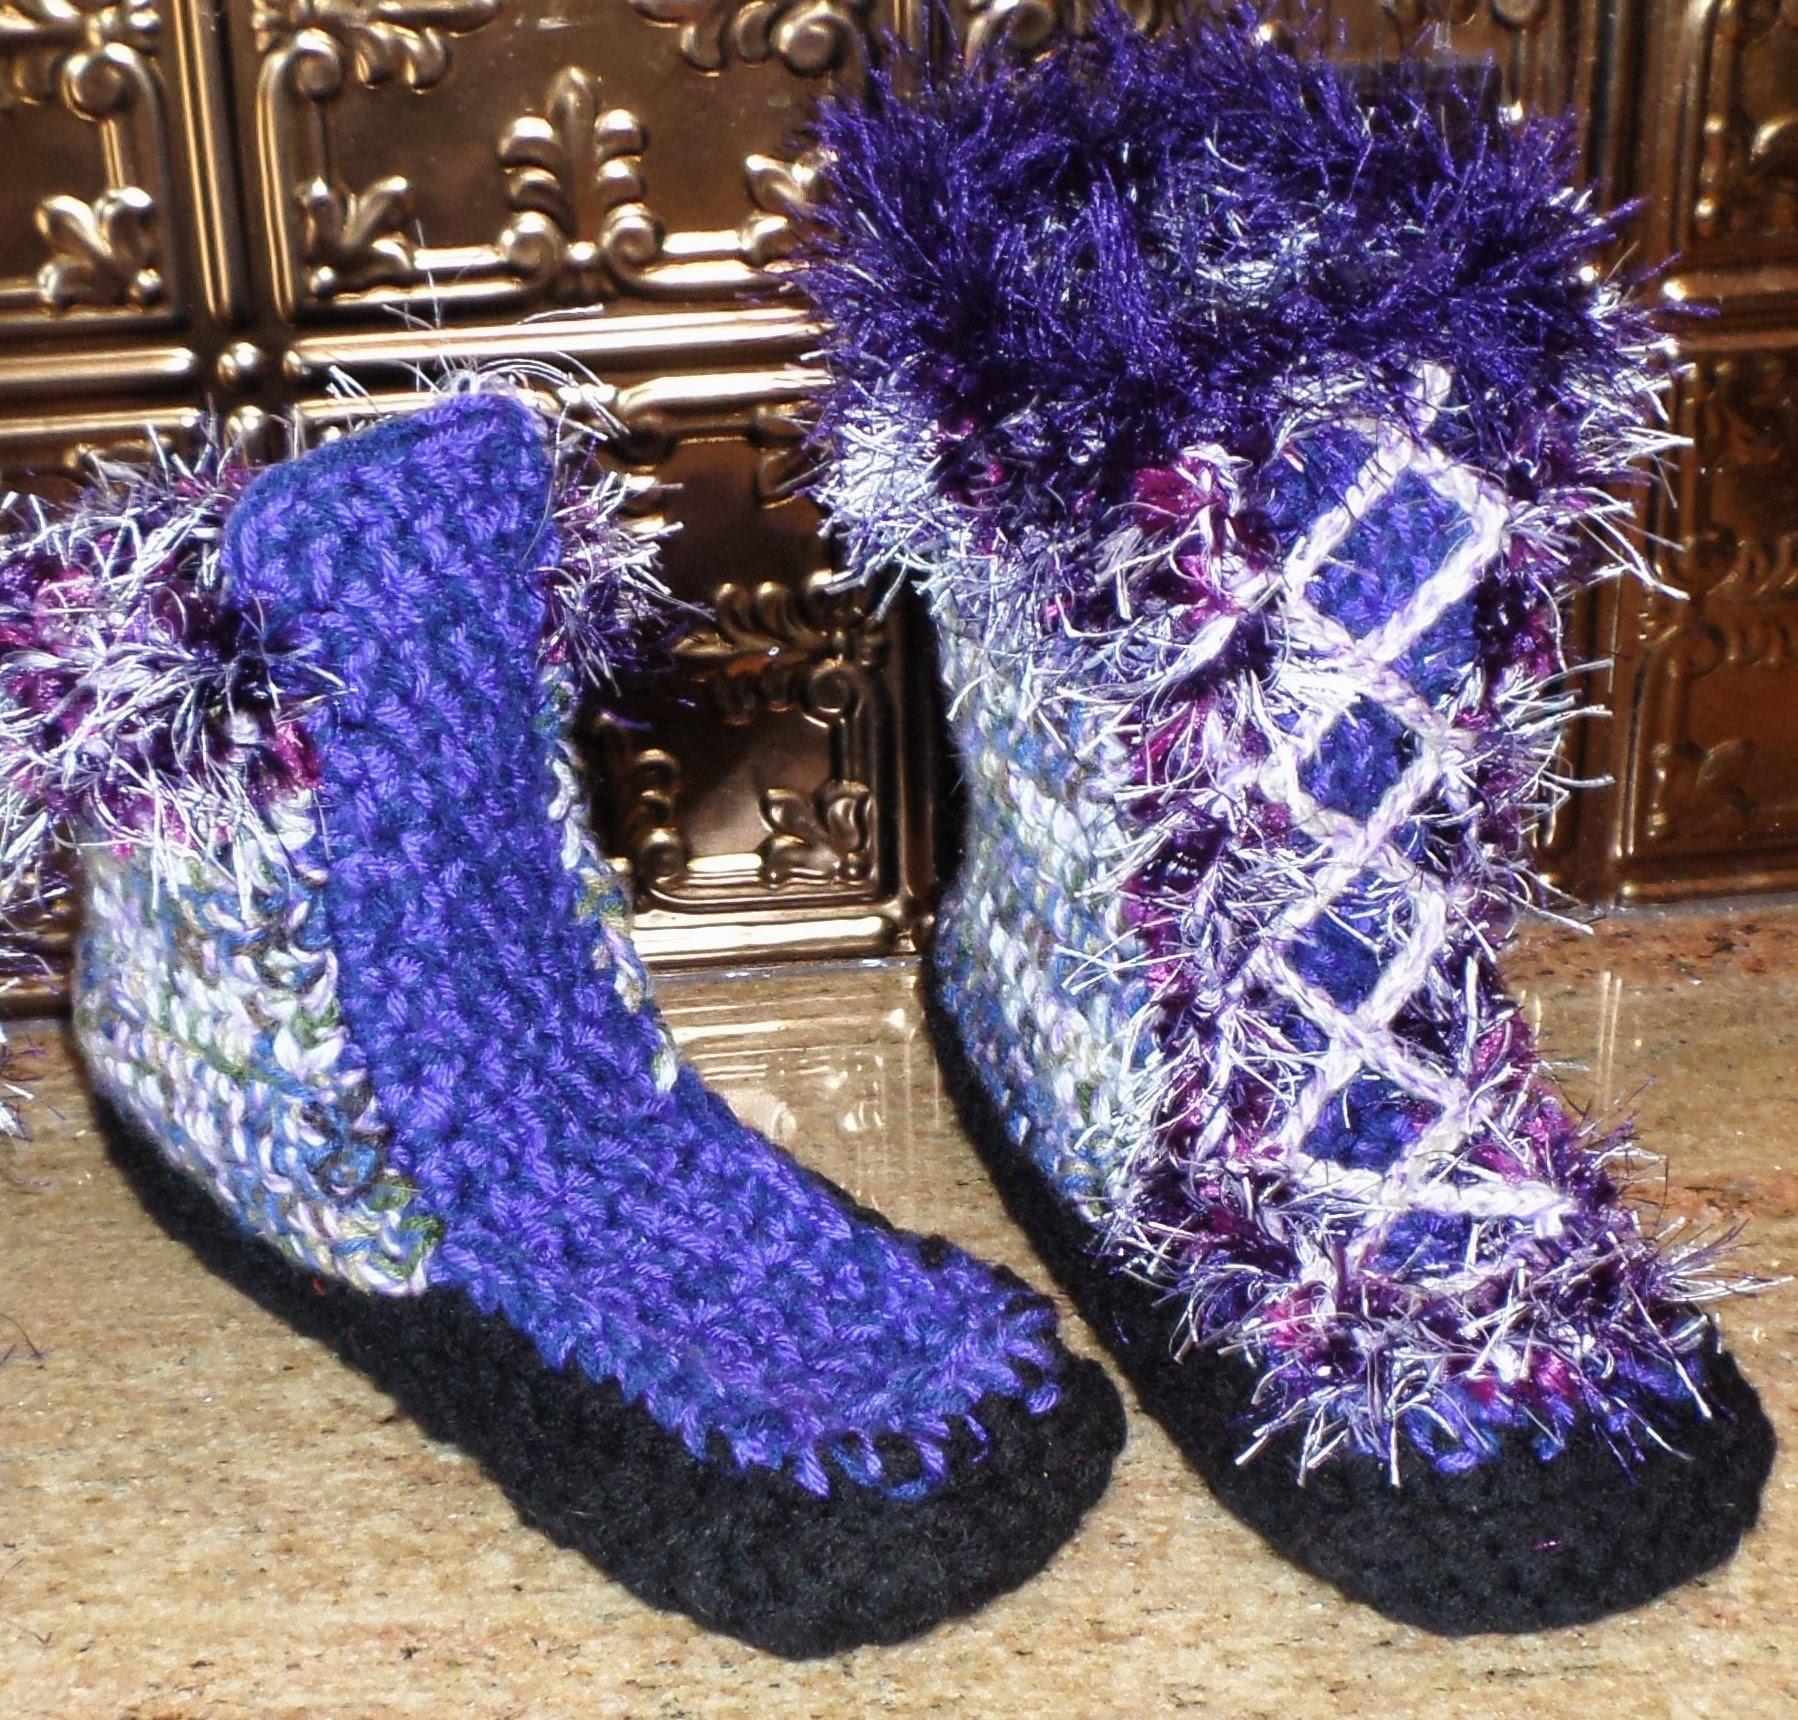 Crcohet Slipper Boot - Step 4 & Finish -